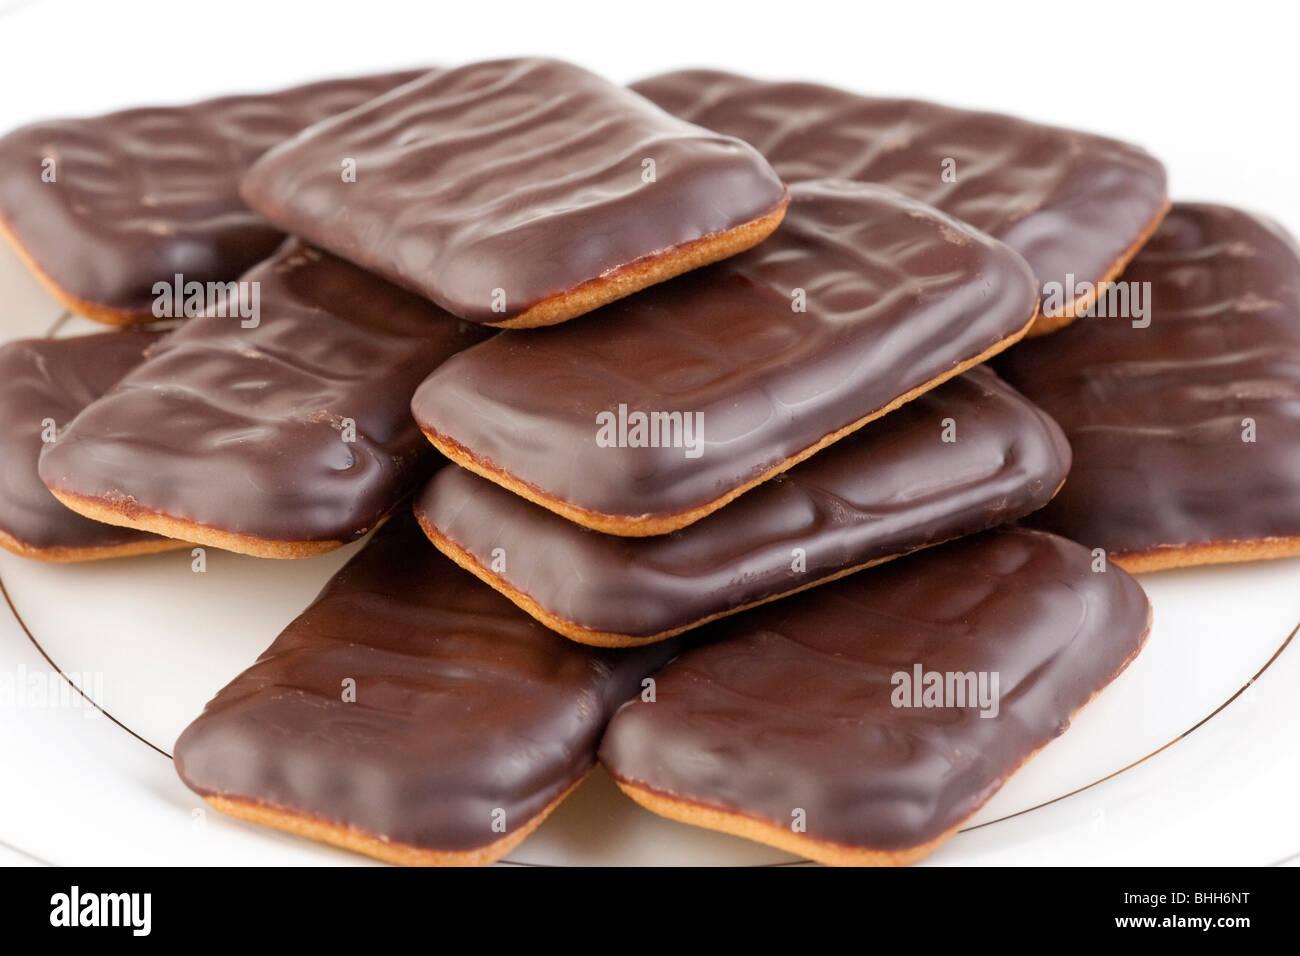 rectangular Jaffa cakes - Stock Image